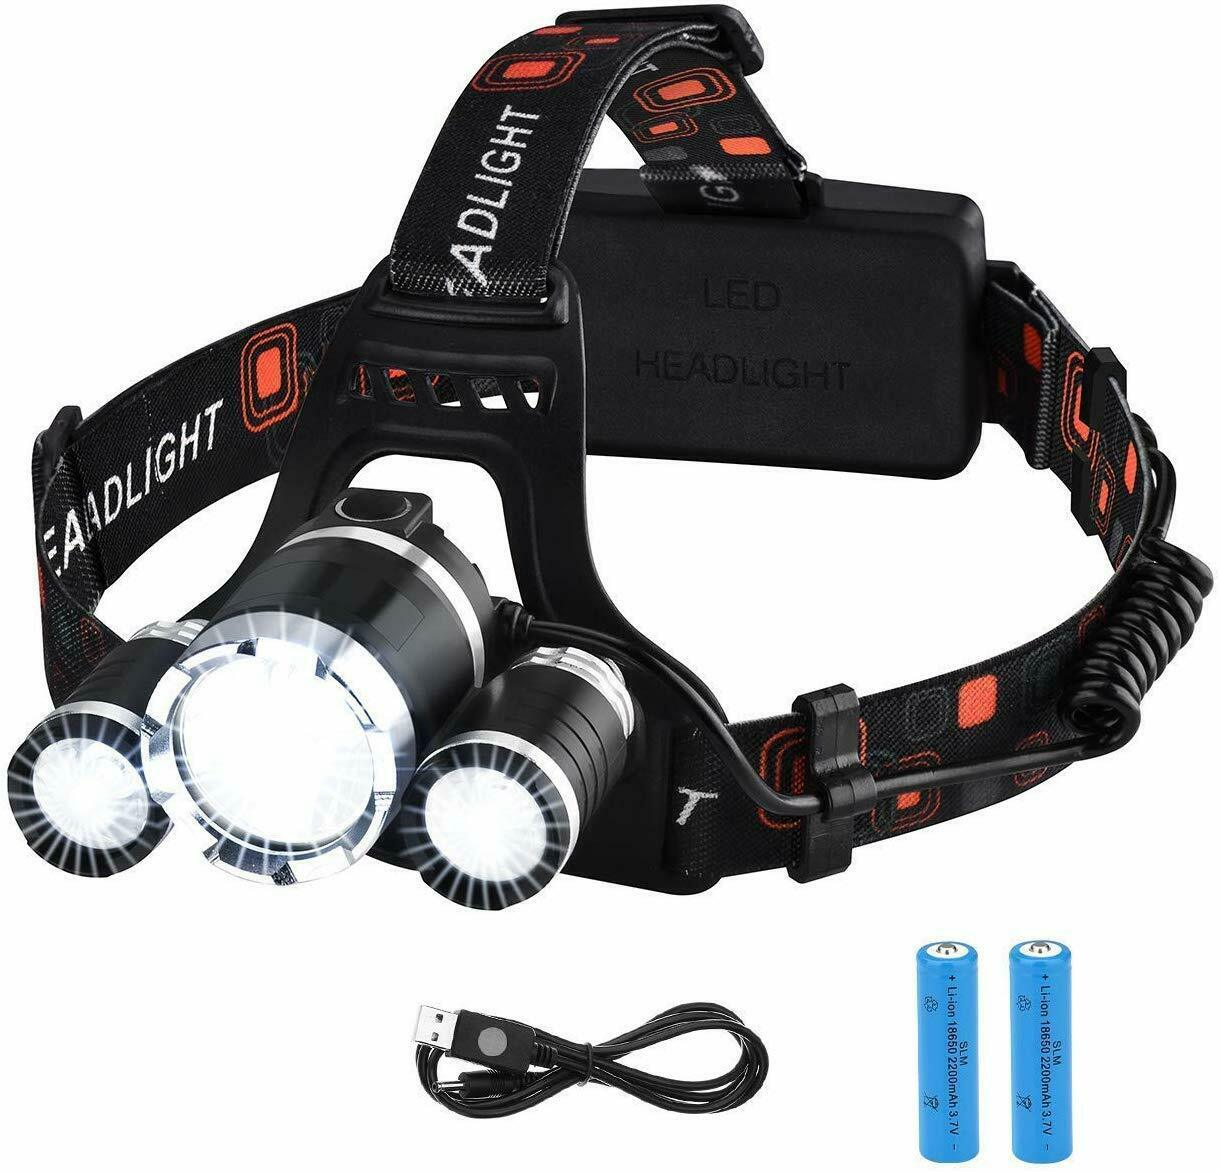 Victsing Flashlight davanti Rechargeable LED High energia 8 Hour Camping autop Bike